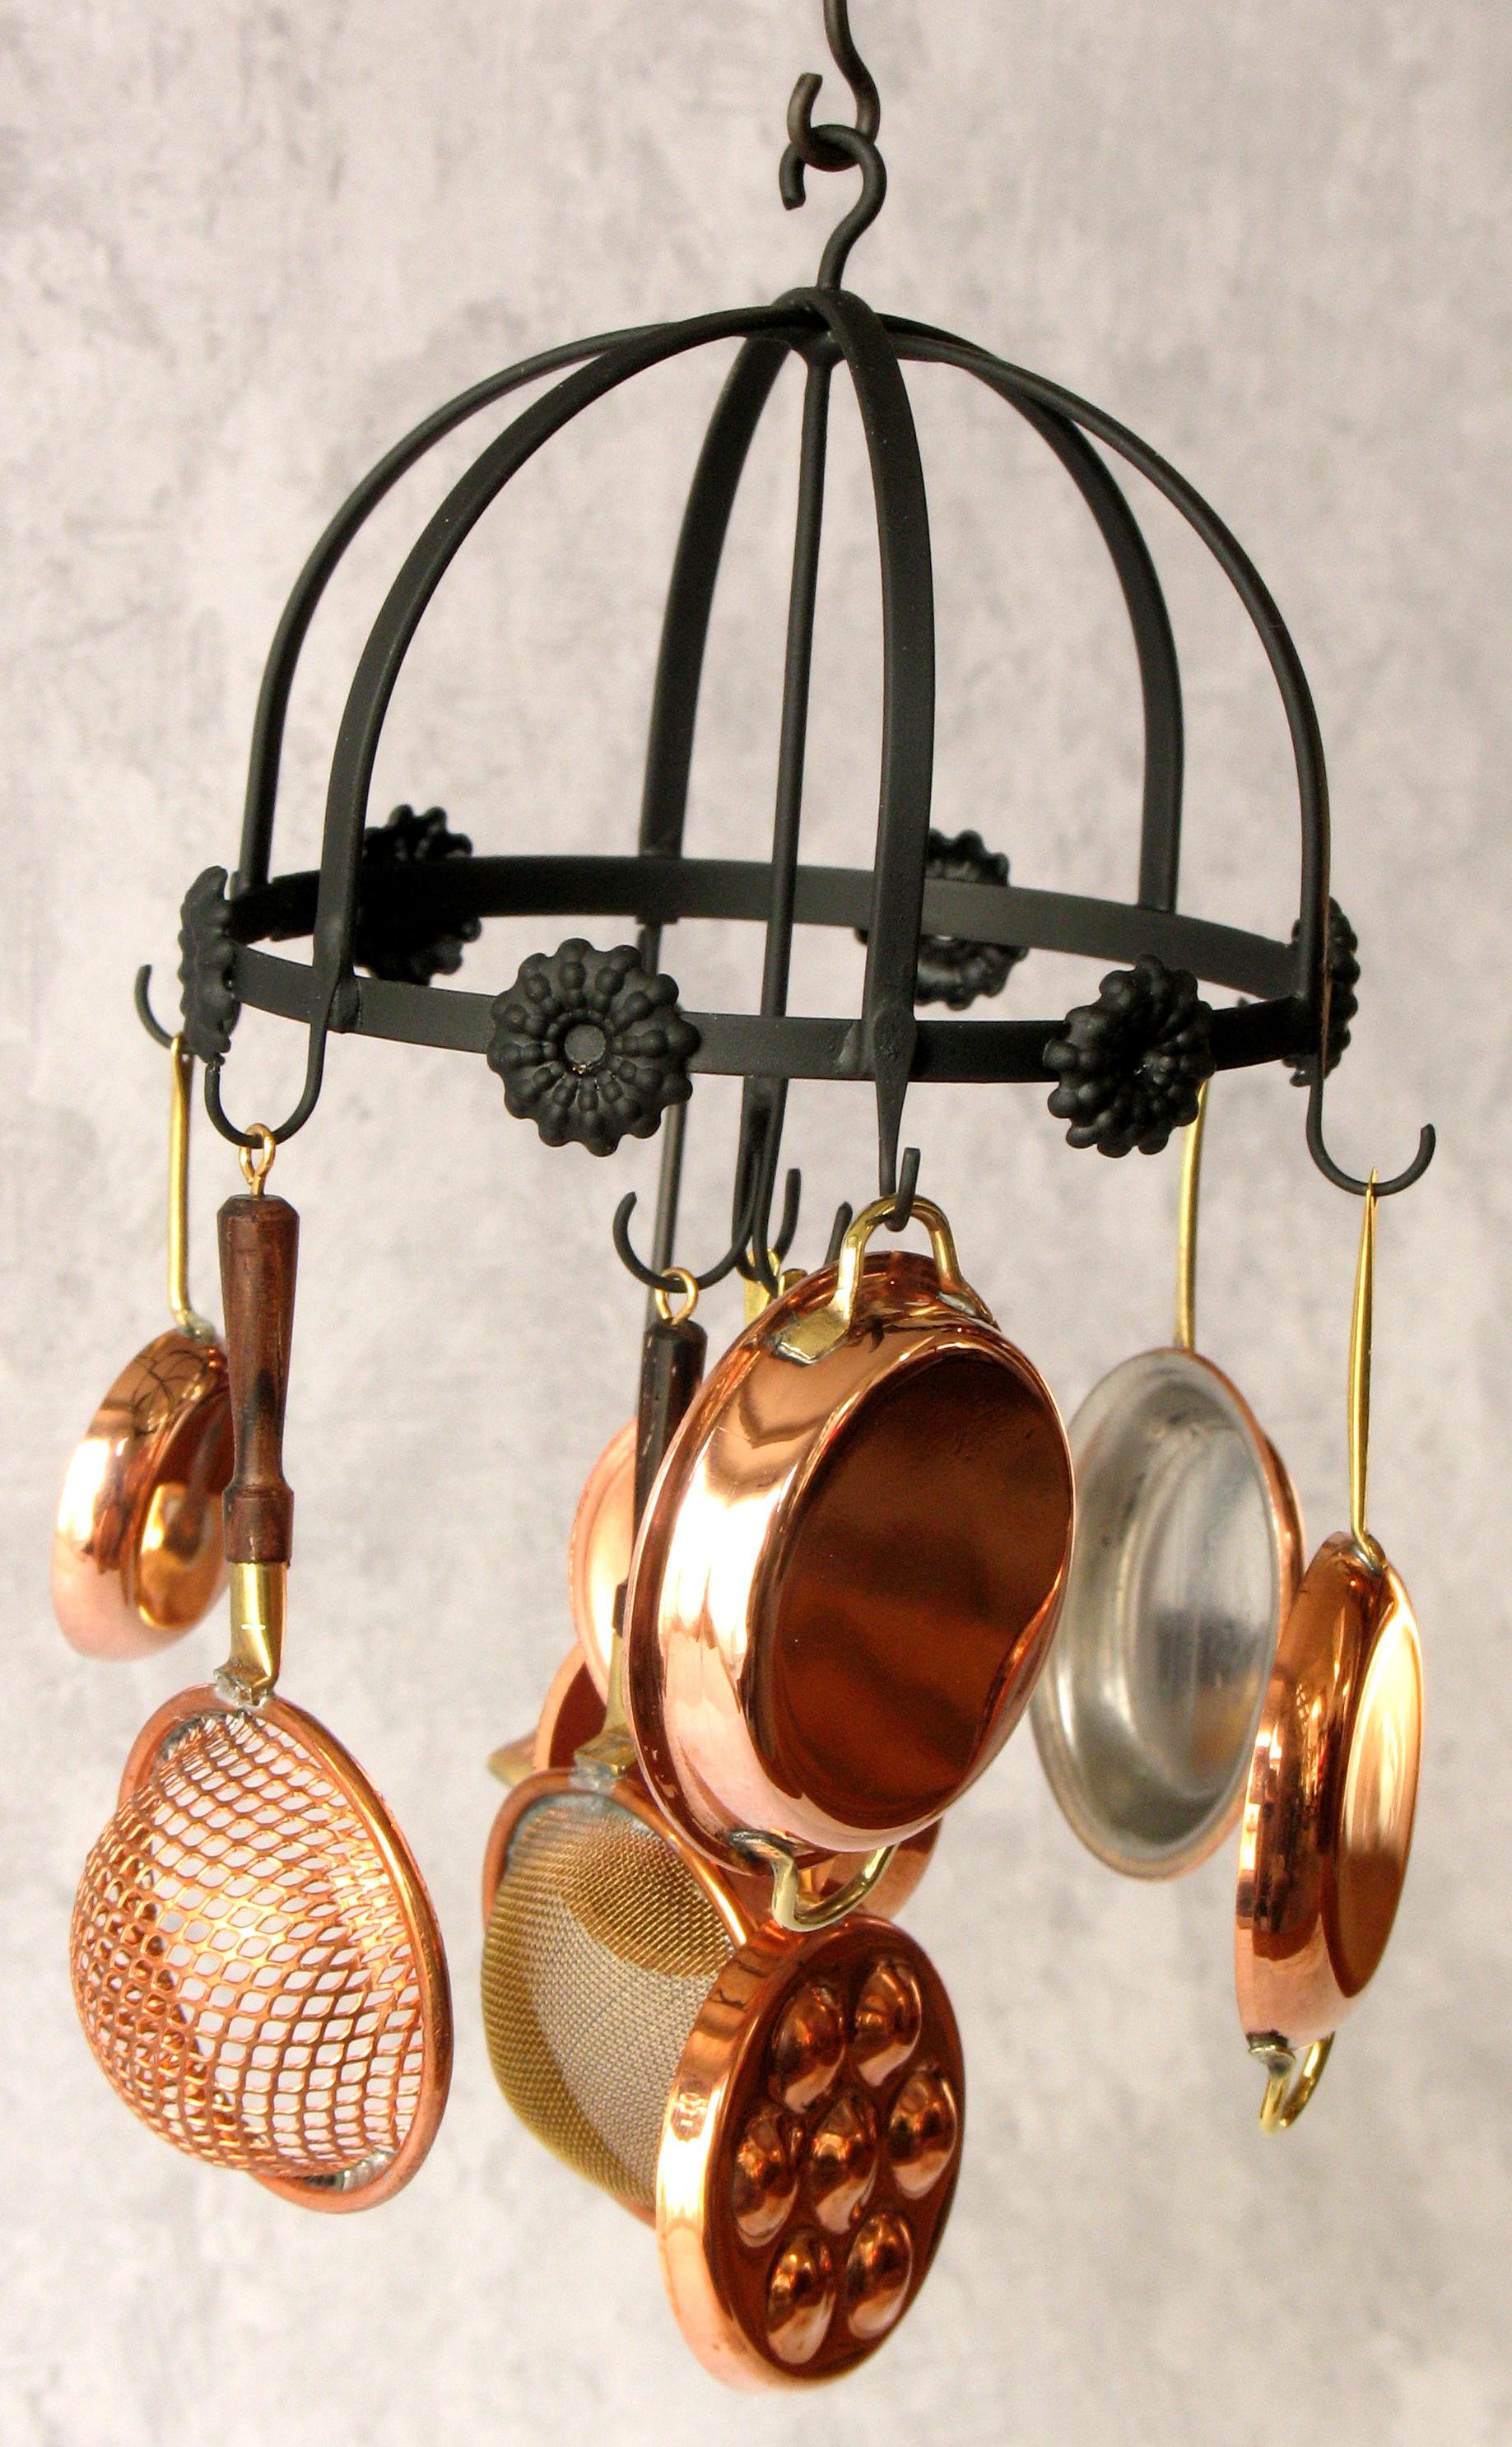 cfm in oval x calphalon product hanging master pot rack racks hayneedle